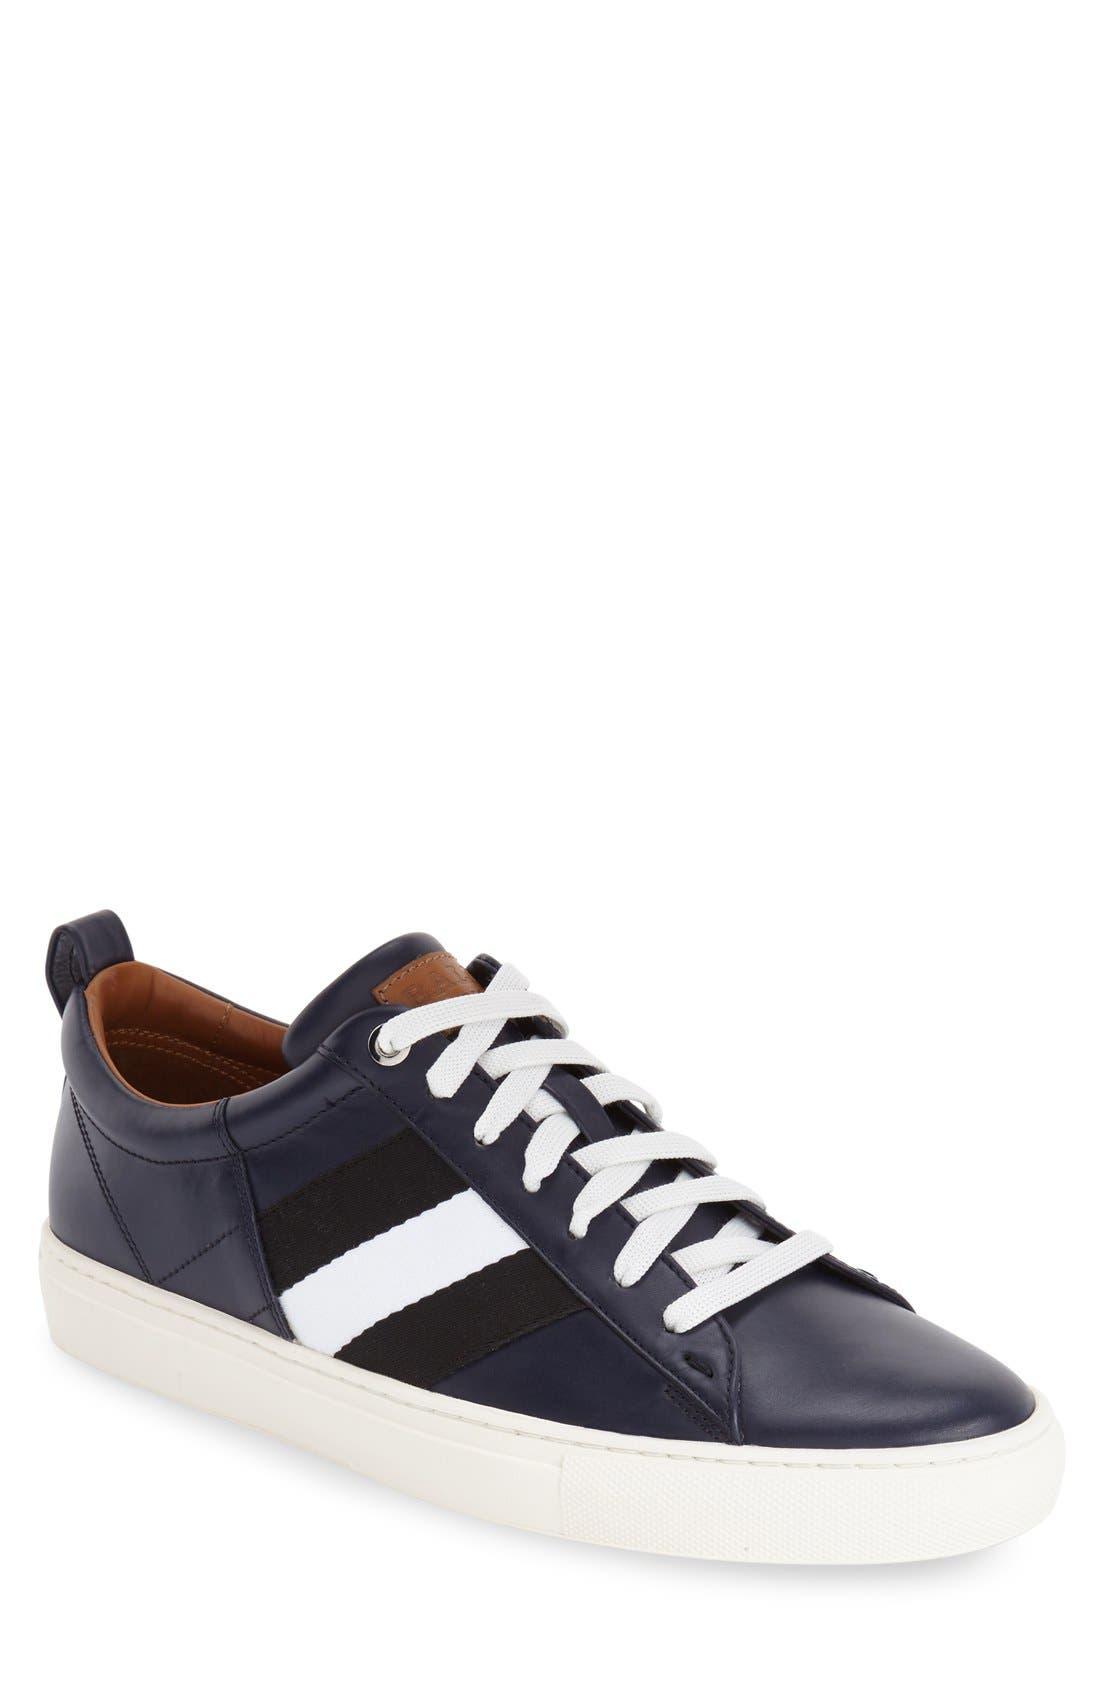 'Helvio' Sneaker,                         Main,                         color,